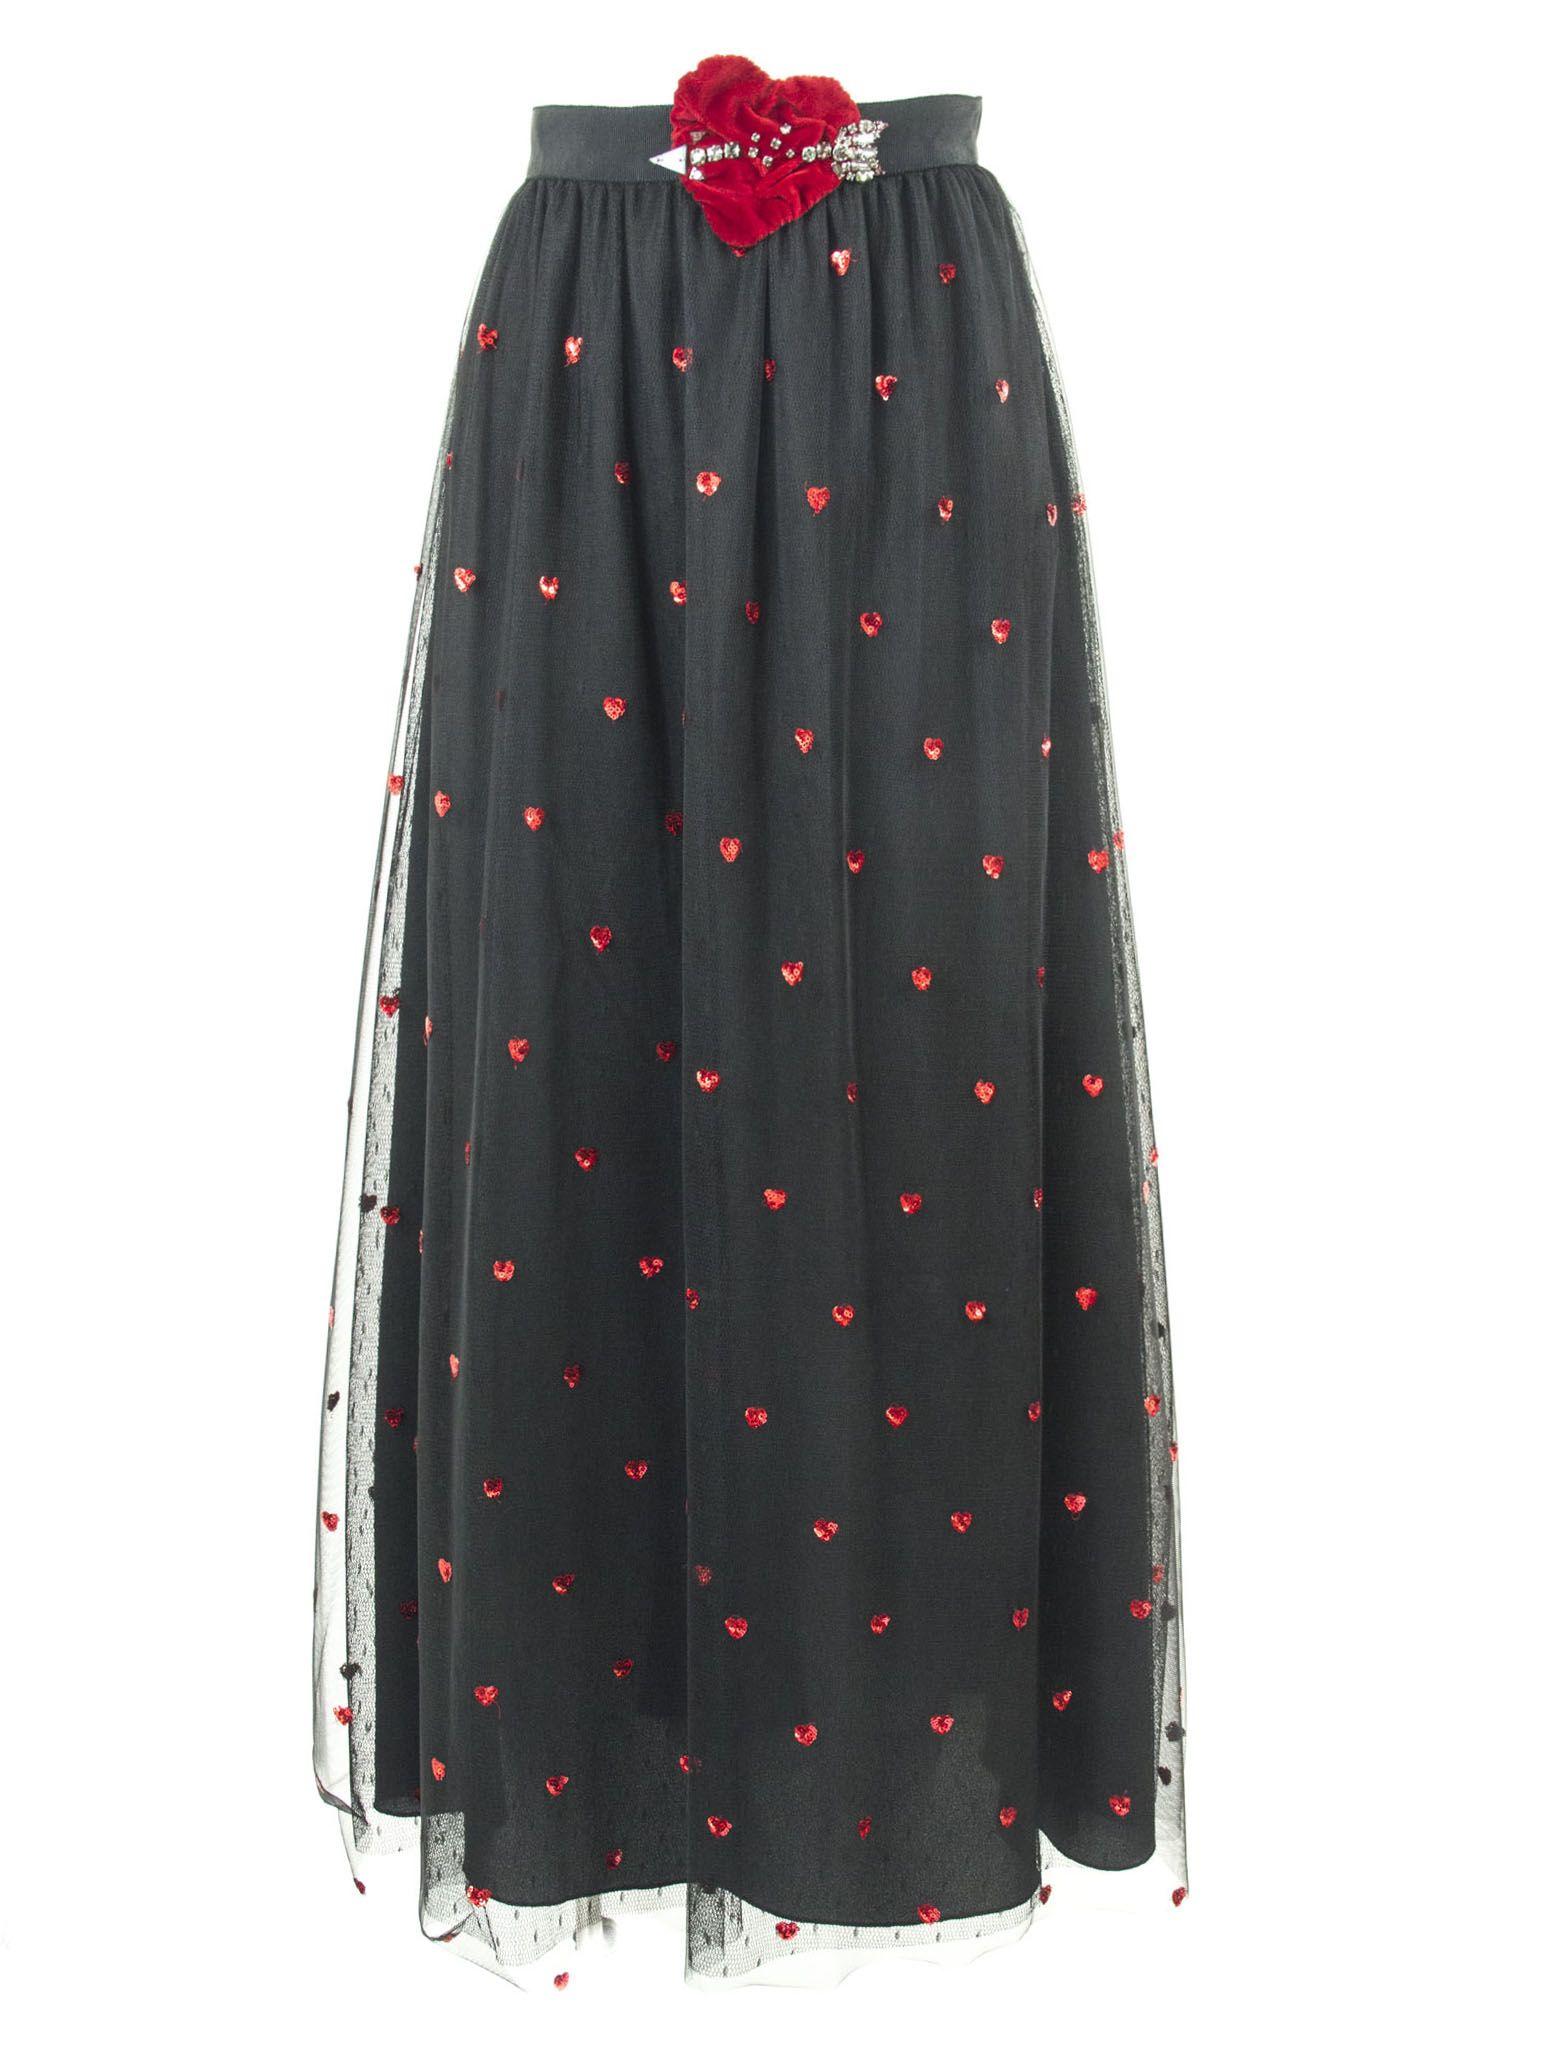 1448dff7c5 RED Valentino RED Valentino Black Point D'esprit Tulle Skirt - Nero ...